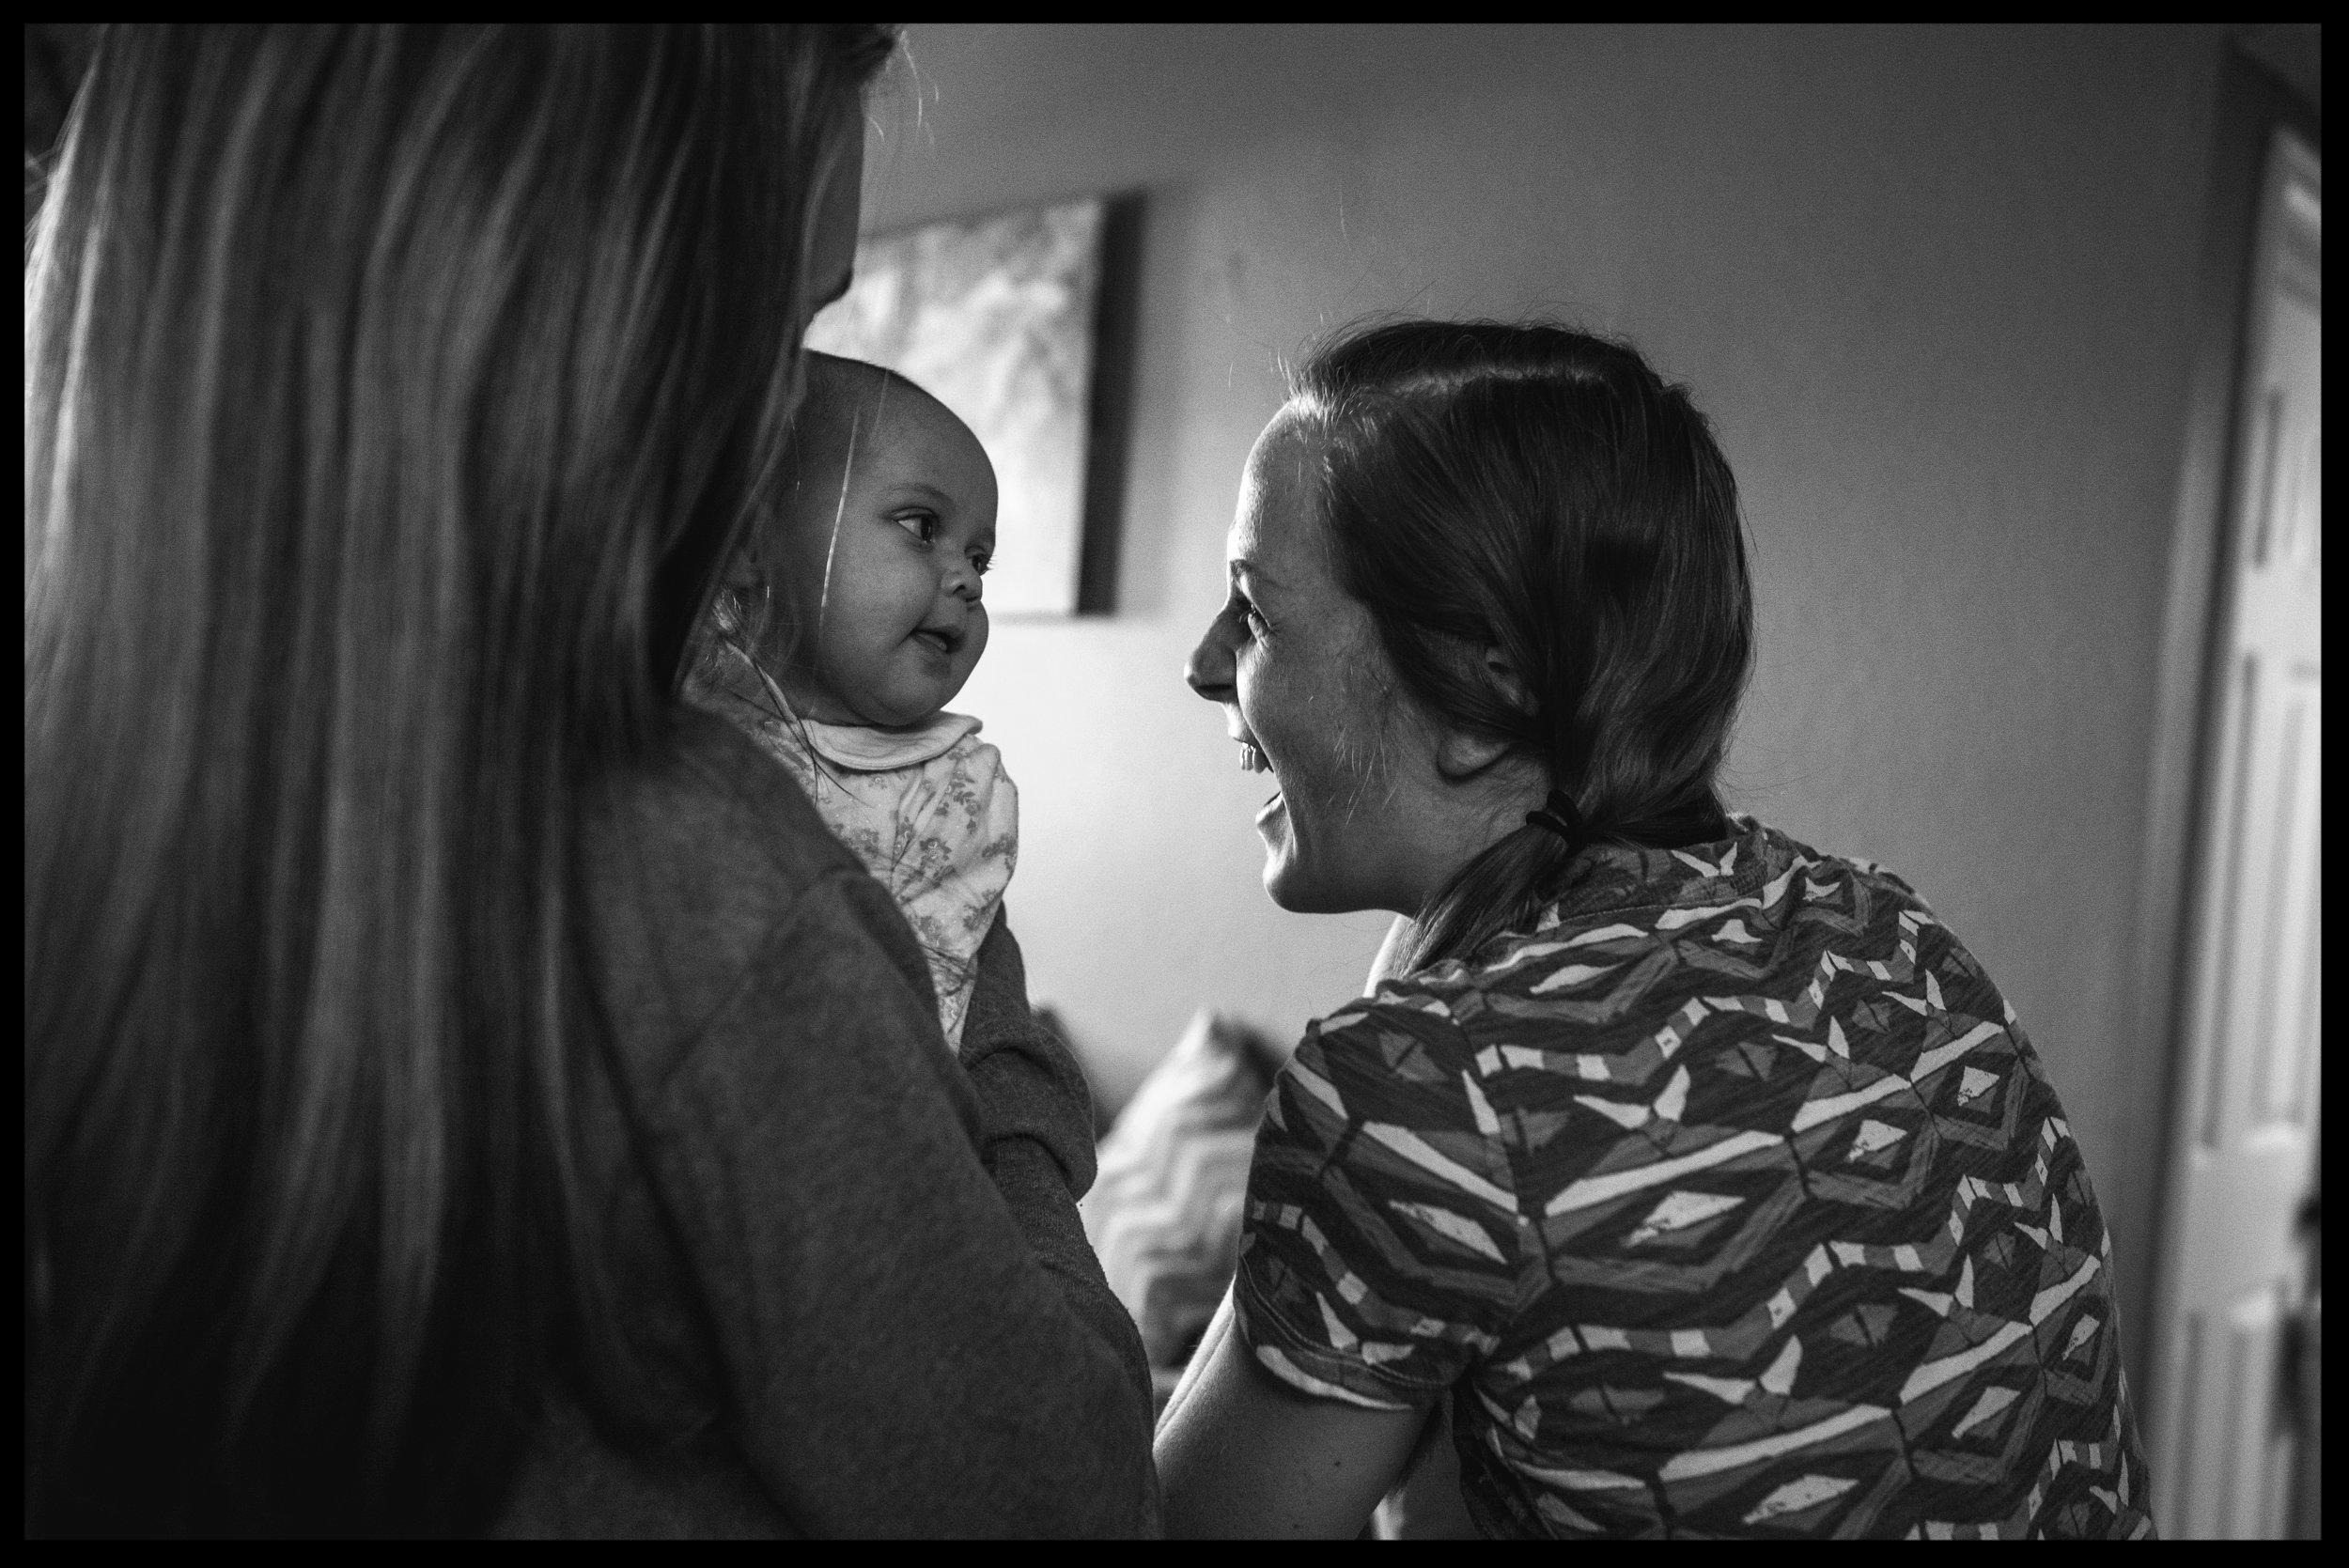 Woman smiles at baby girl, black and white,Aurora, Colorado